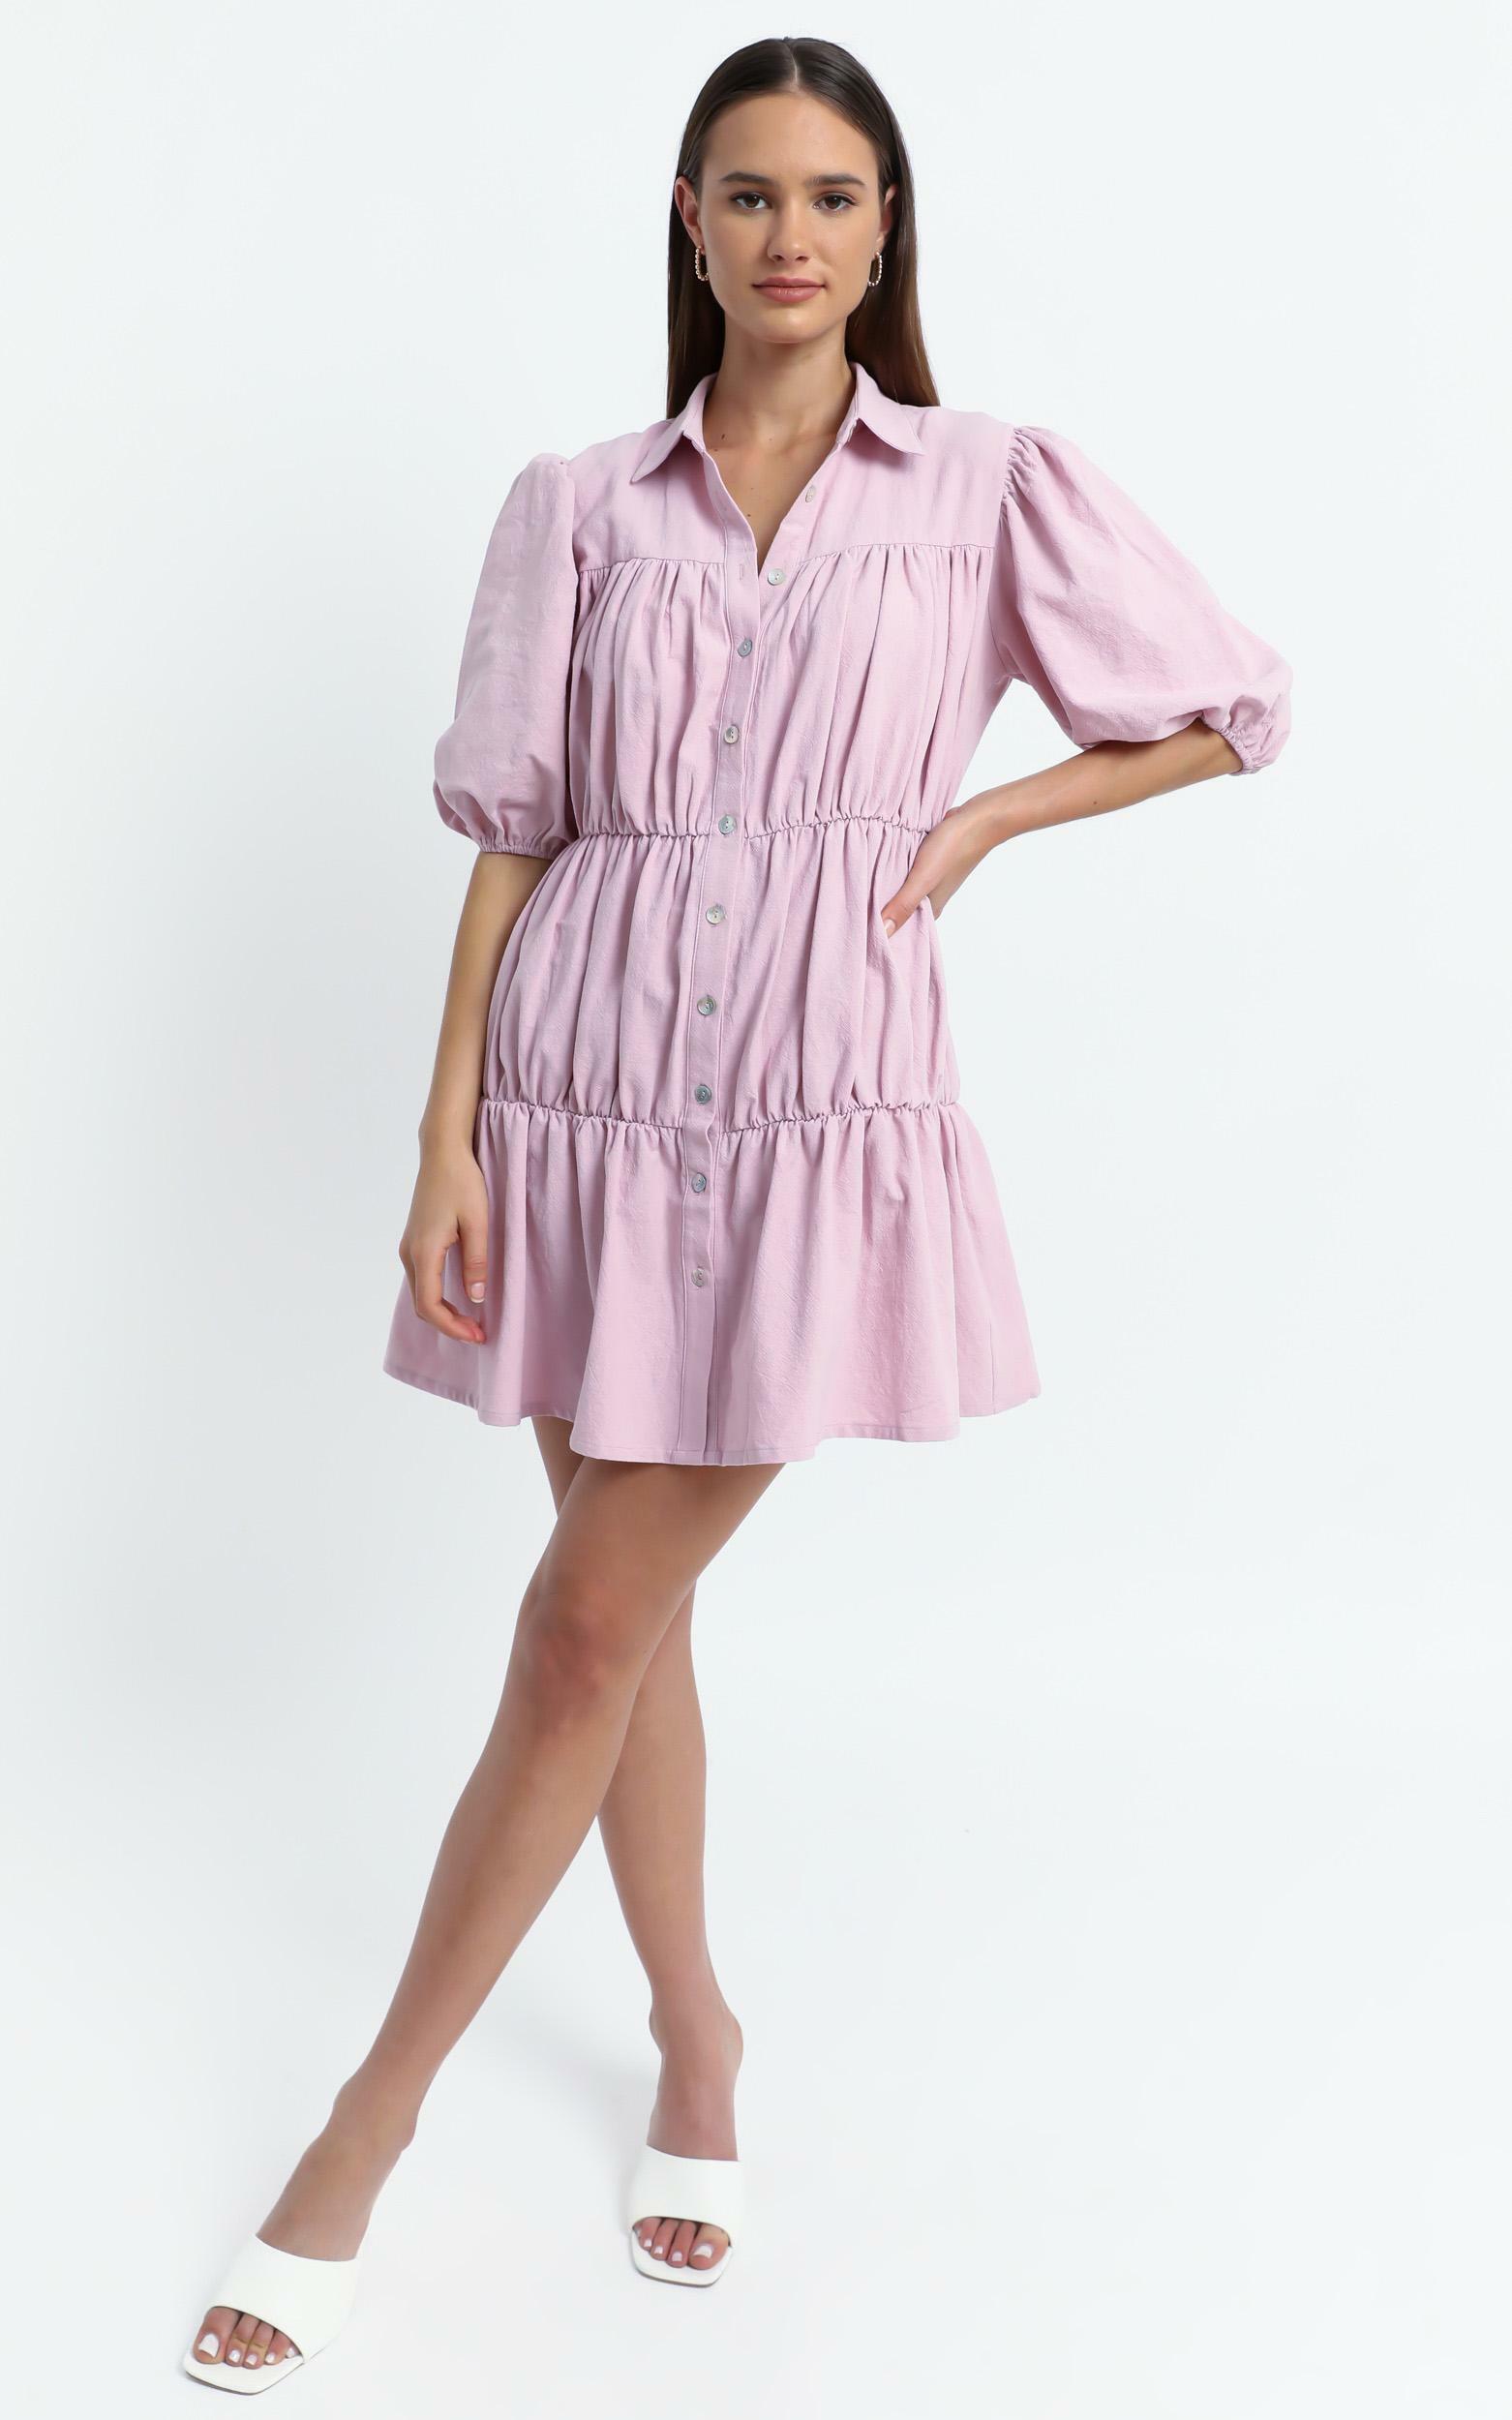 Bijou Dress in Pink - 6 (XS), Pink, hi-res image number null